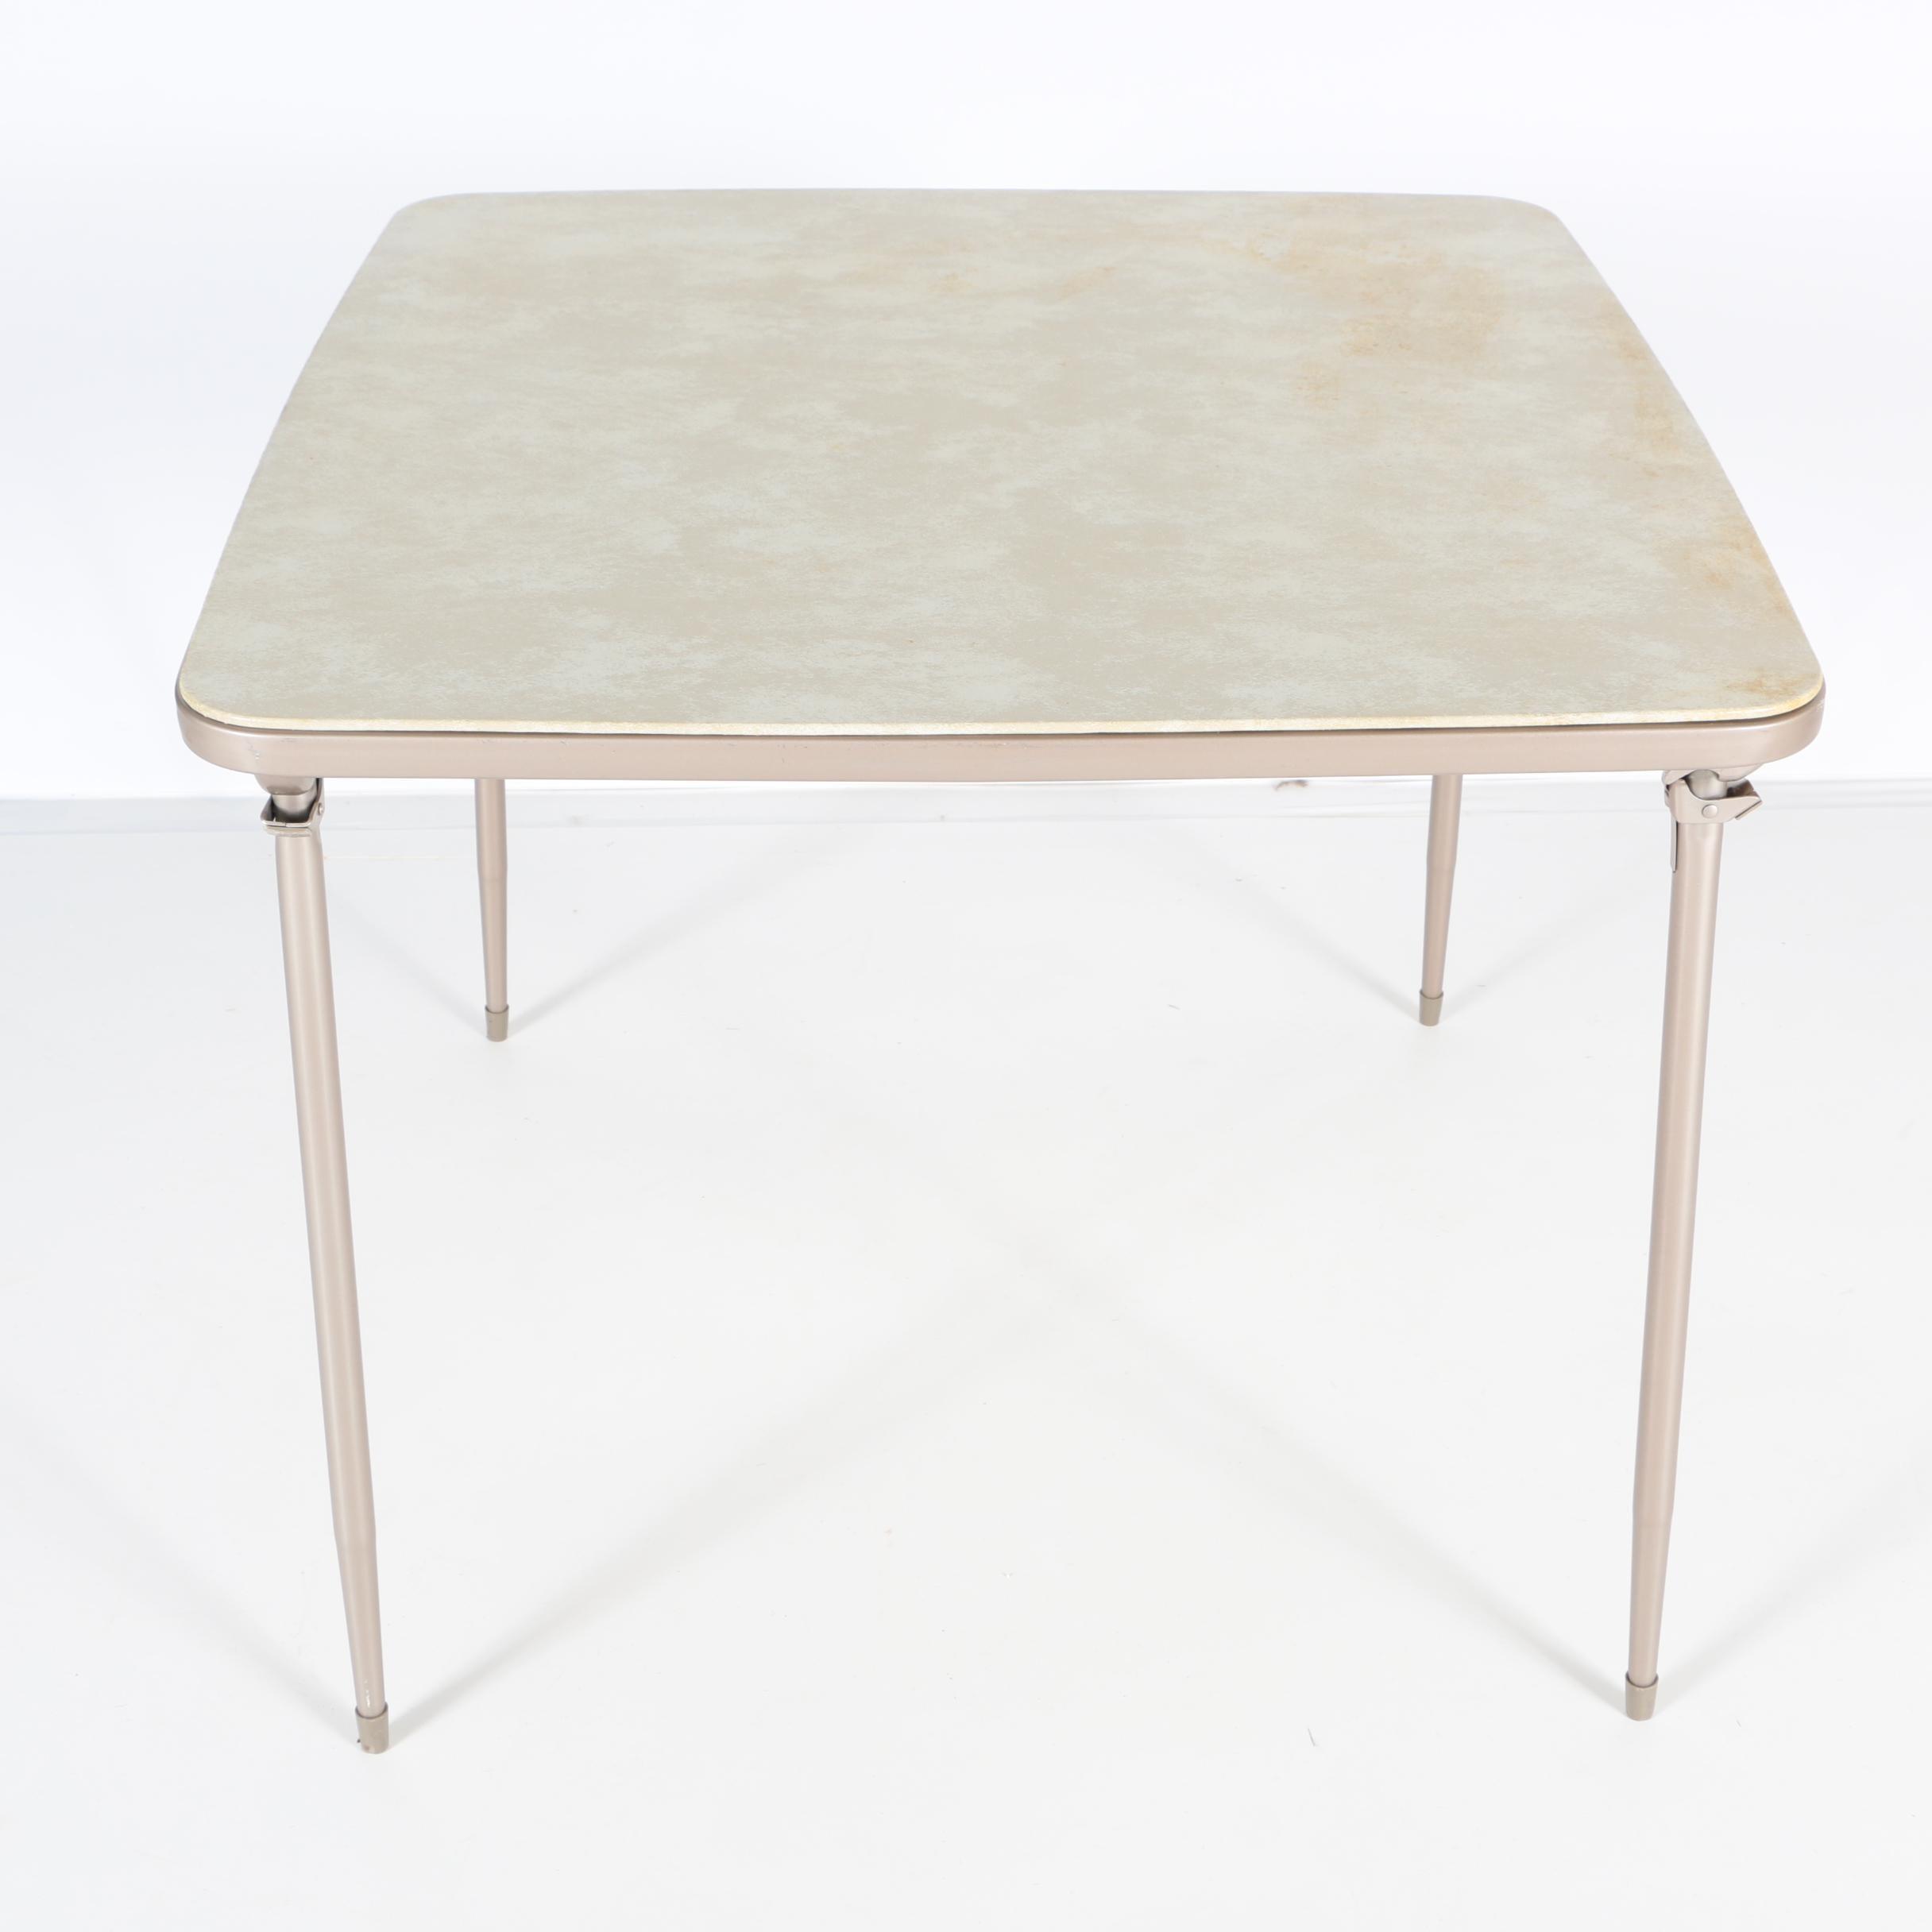 Folding Card Table by Samsonite